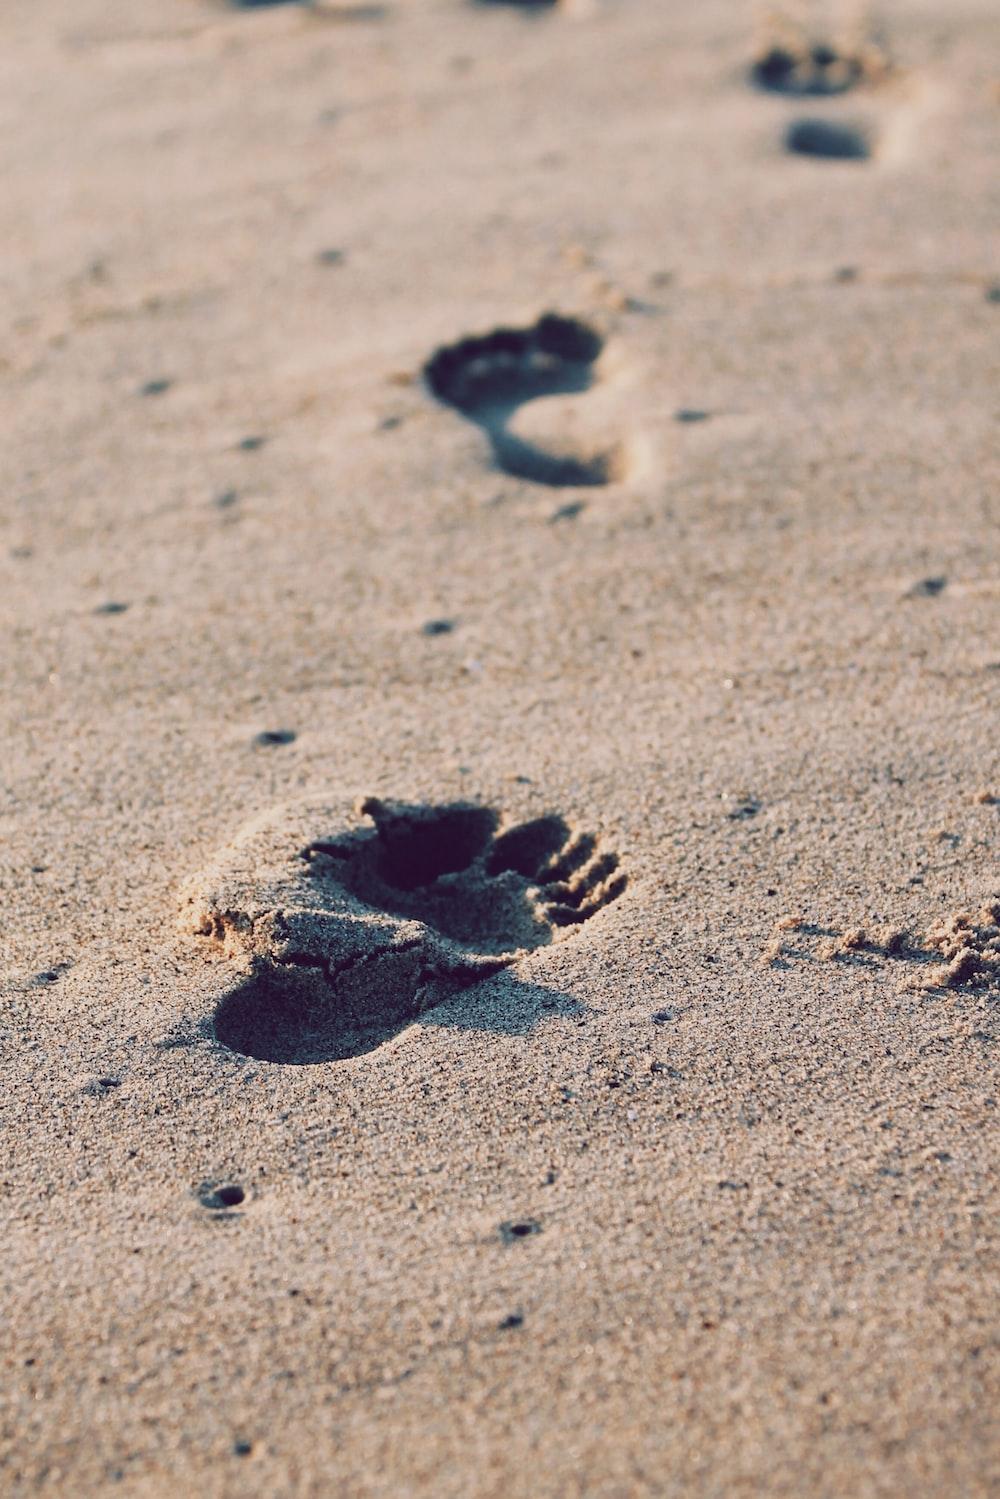 foot prints on beach sand